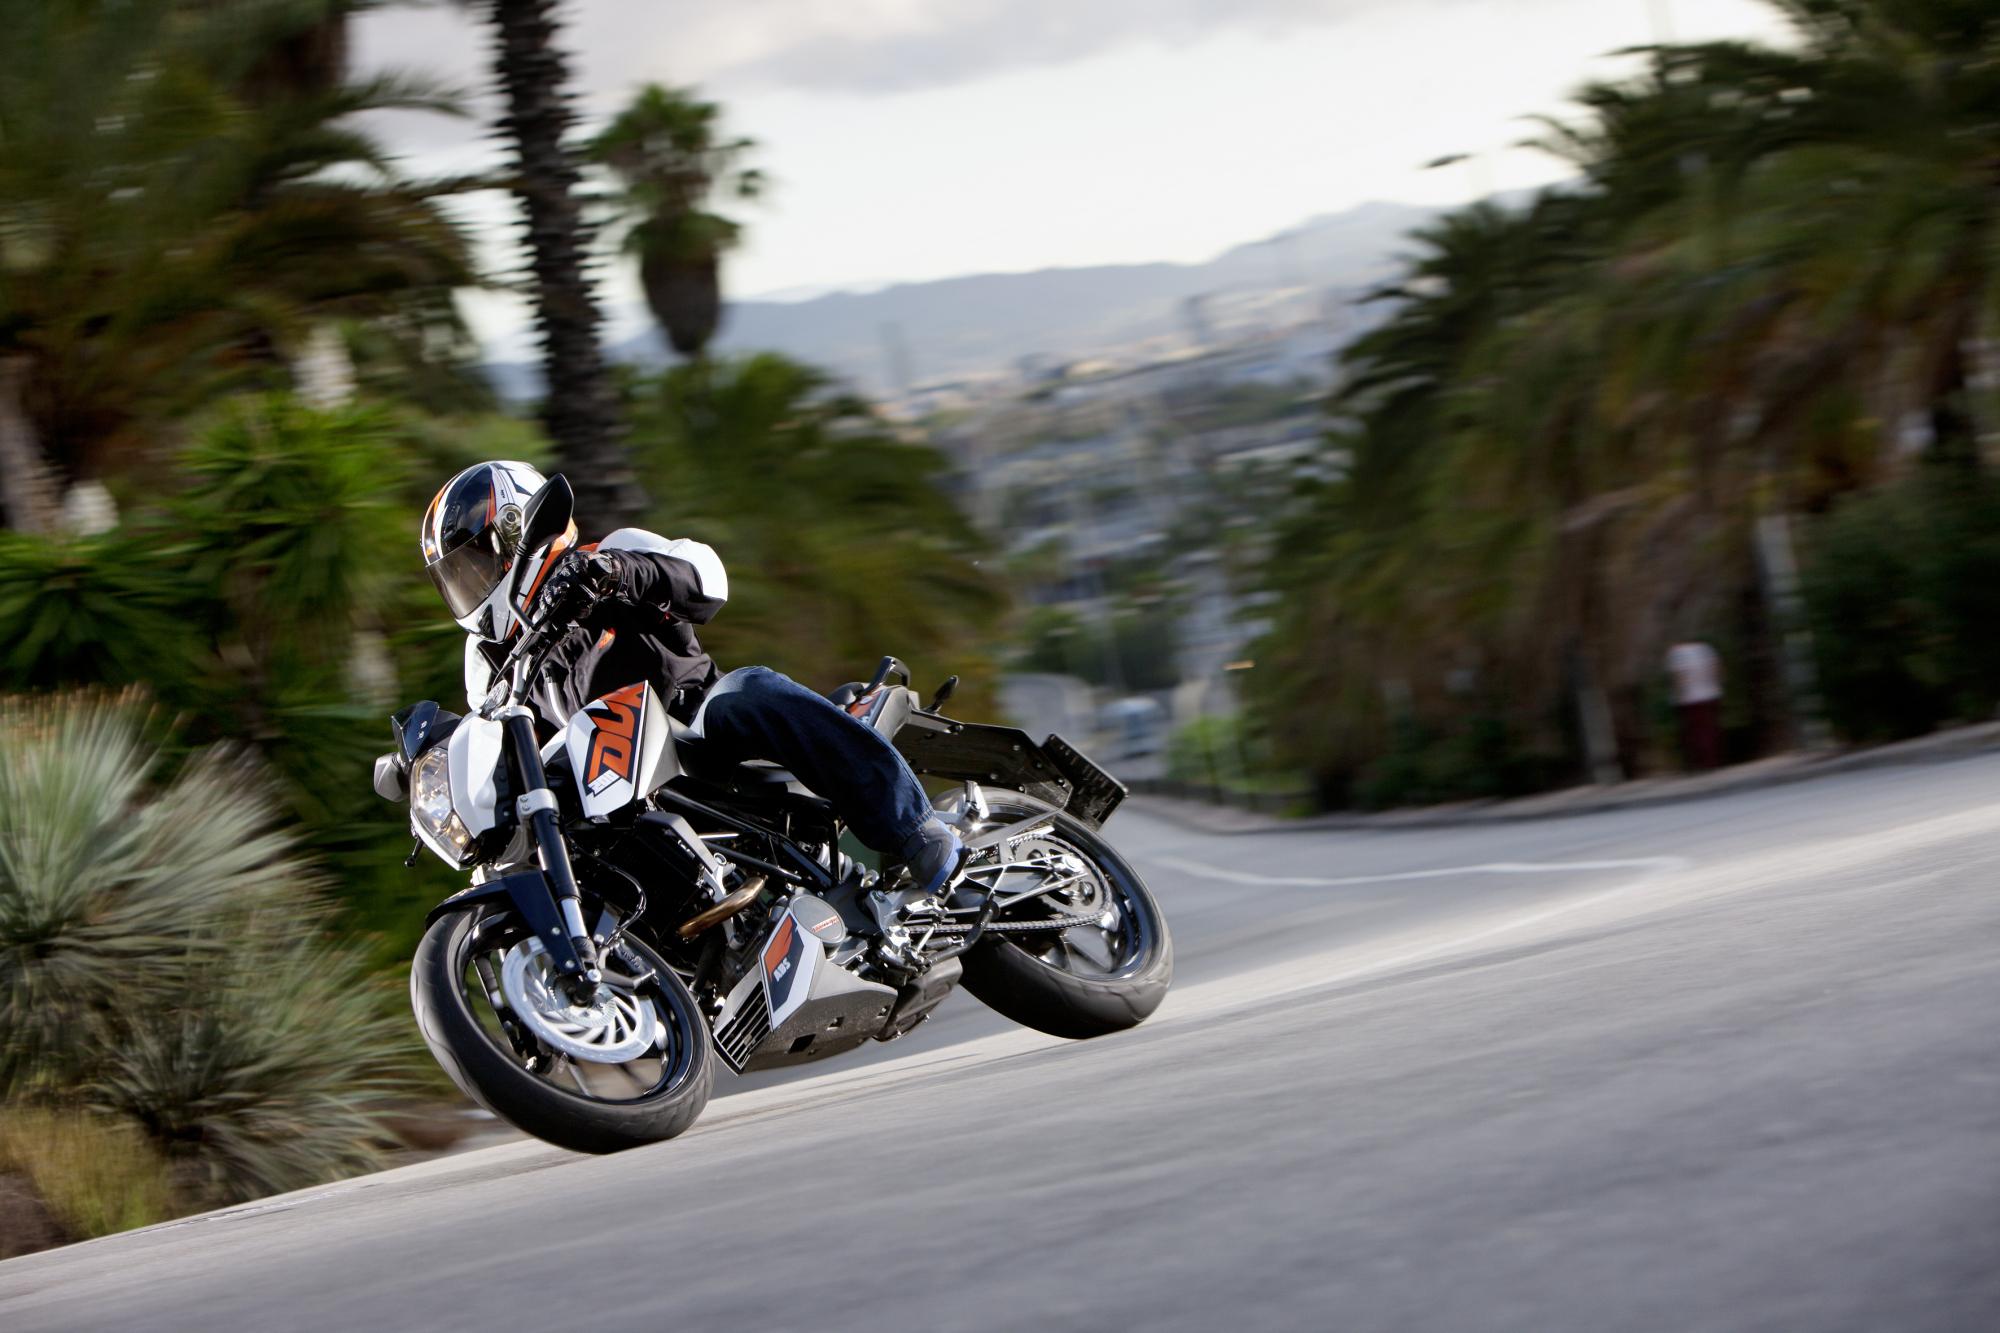 ktm 690 duke 0 60 - motorcycle wallpaper